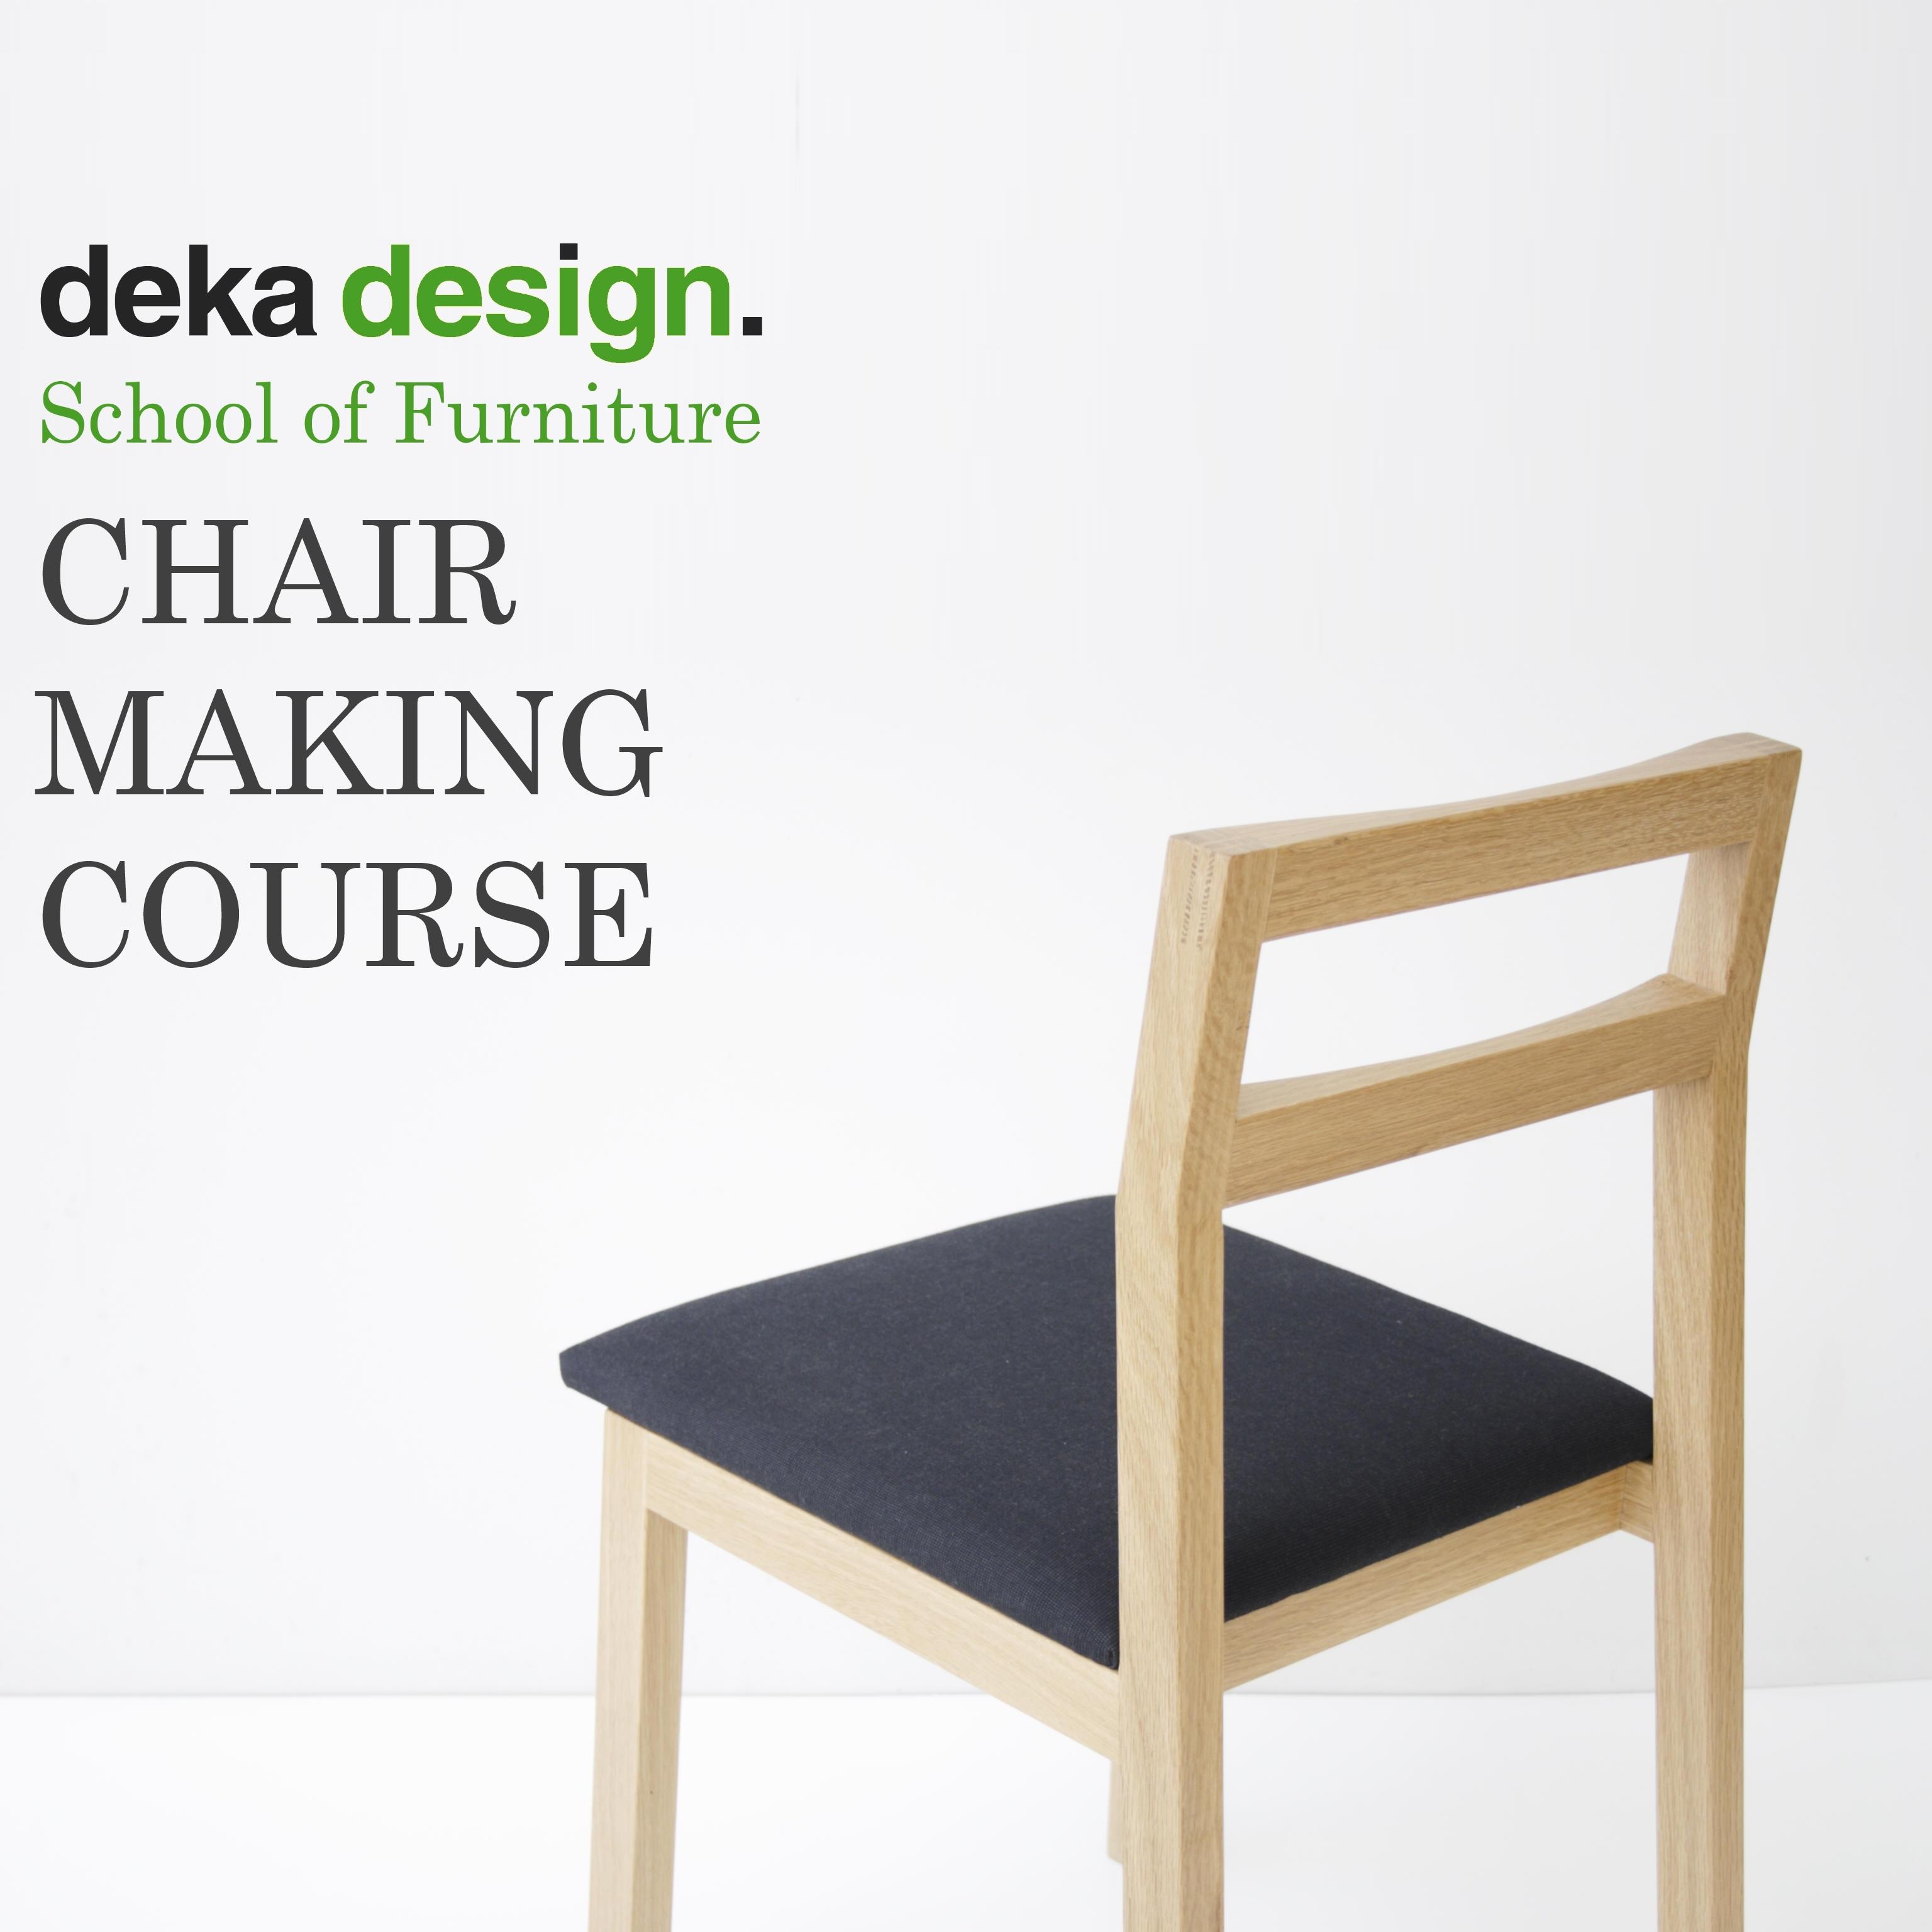 Chair Making Course Lasse Kinnunen